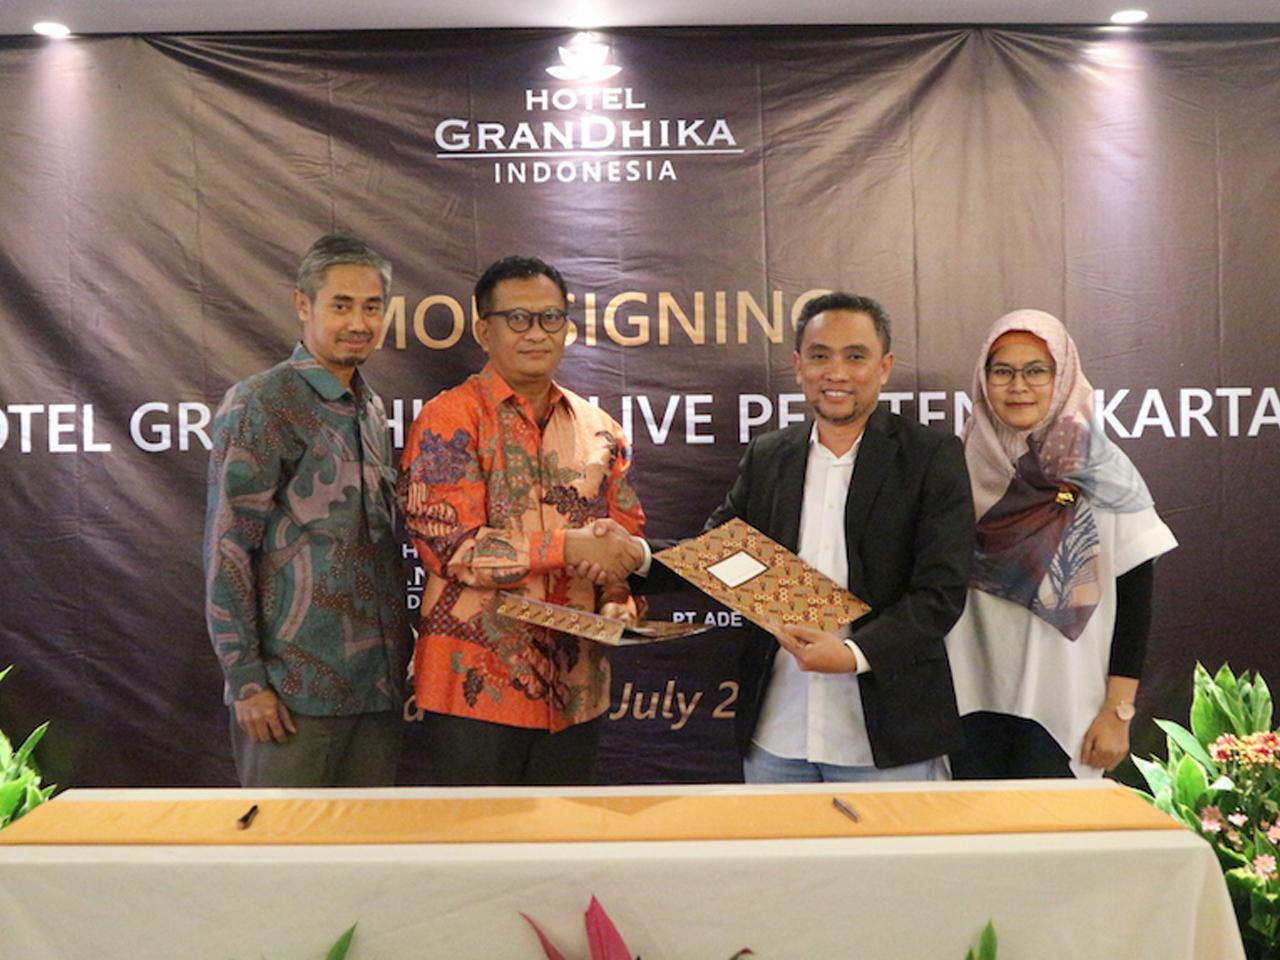 Ekspansi Hotel Grandhika Indonesia Melalui Hotel Grandhika Olive Pejaten Jakarta Grandhika Hotel